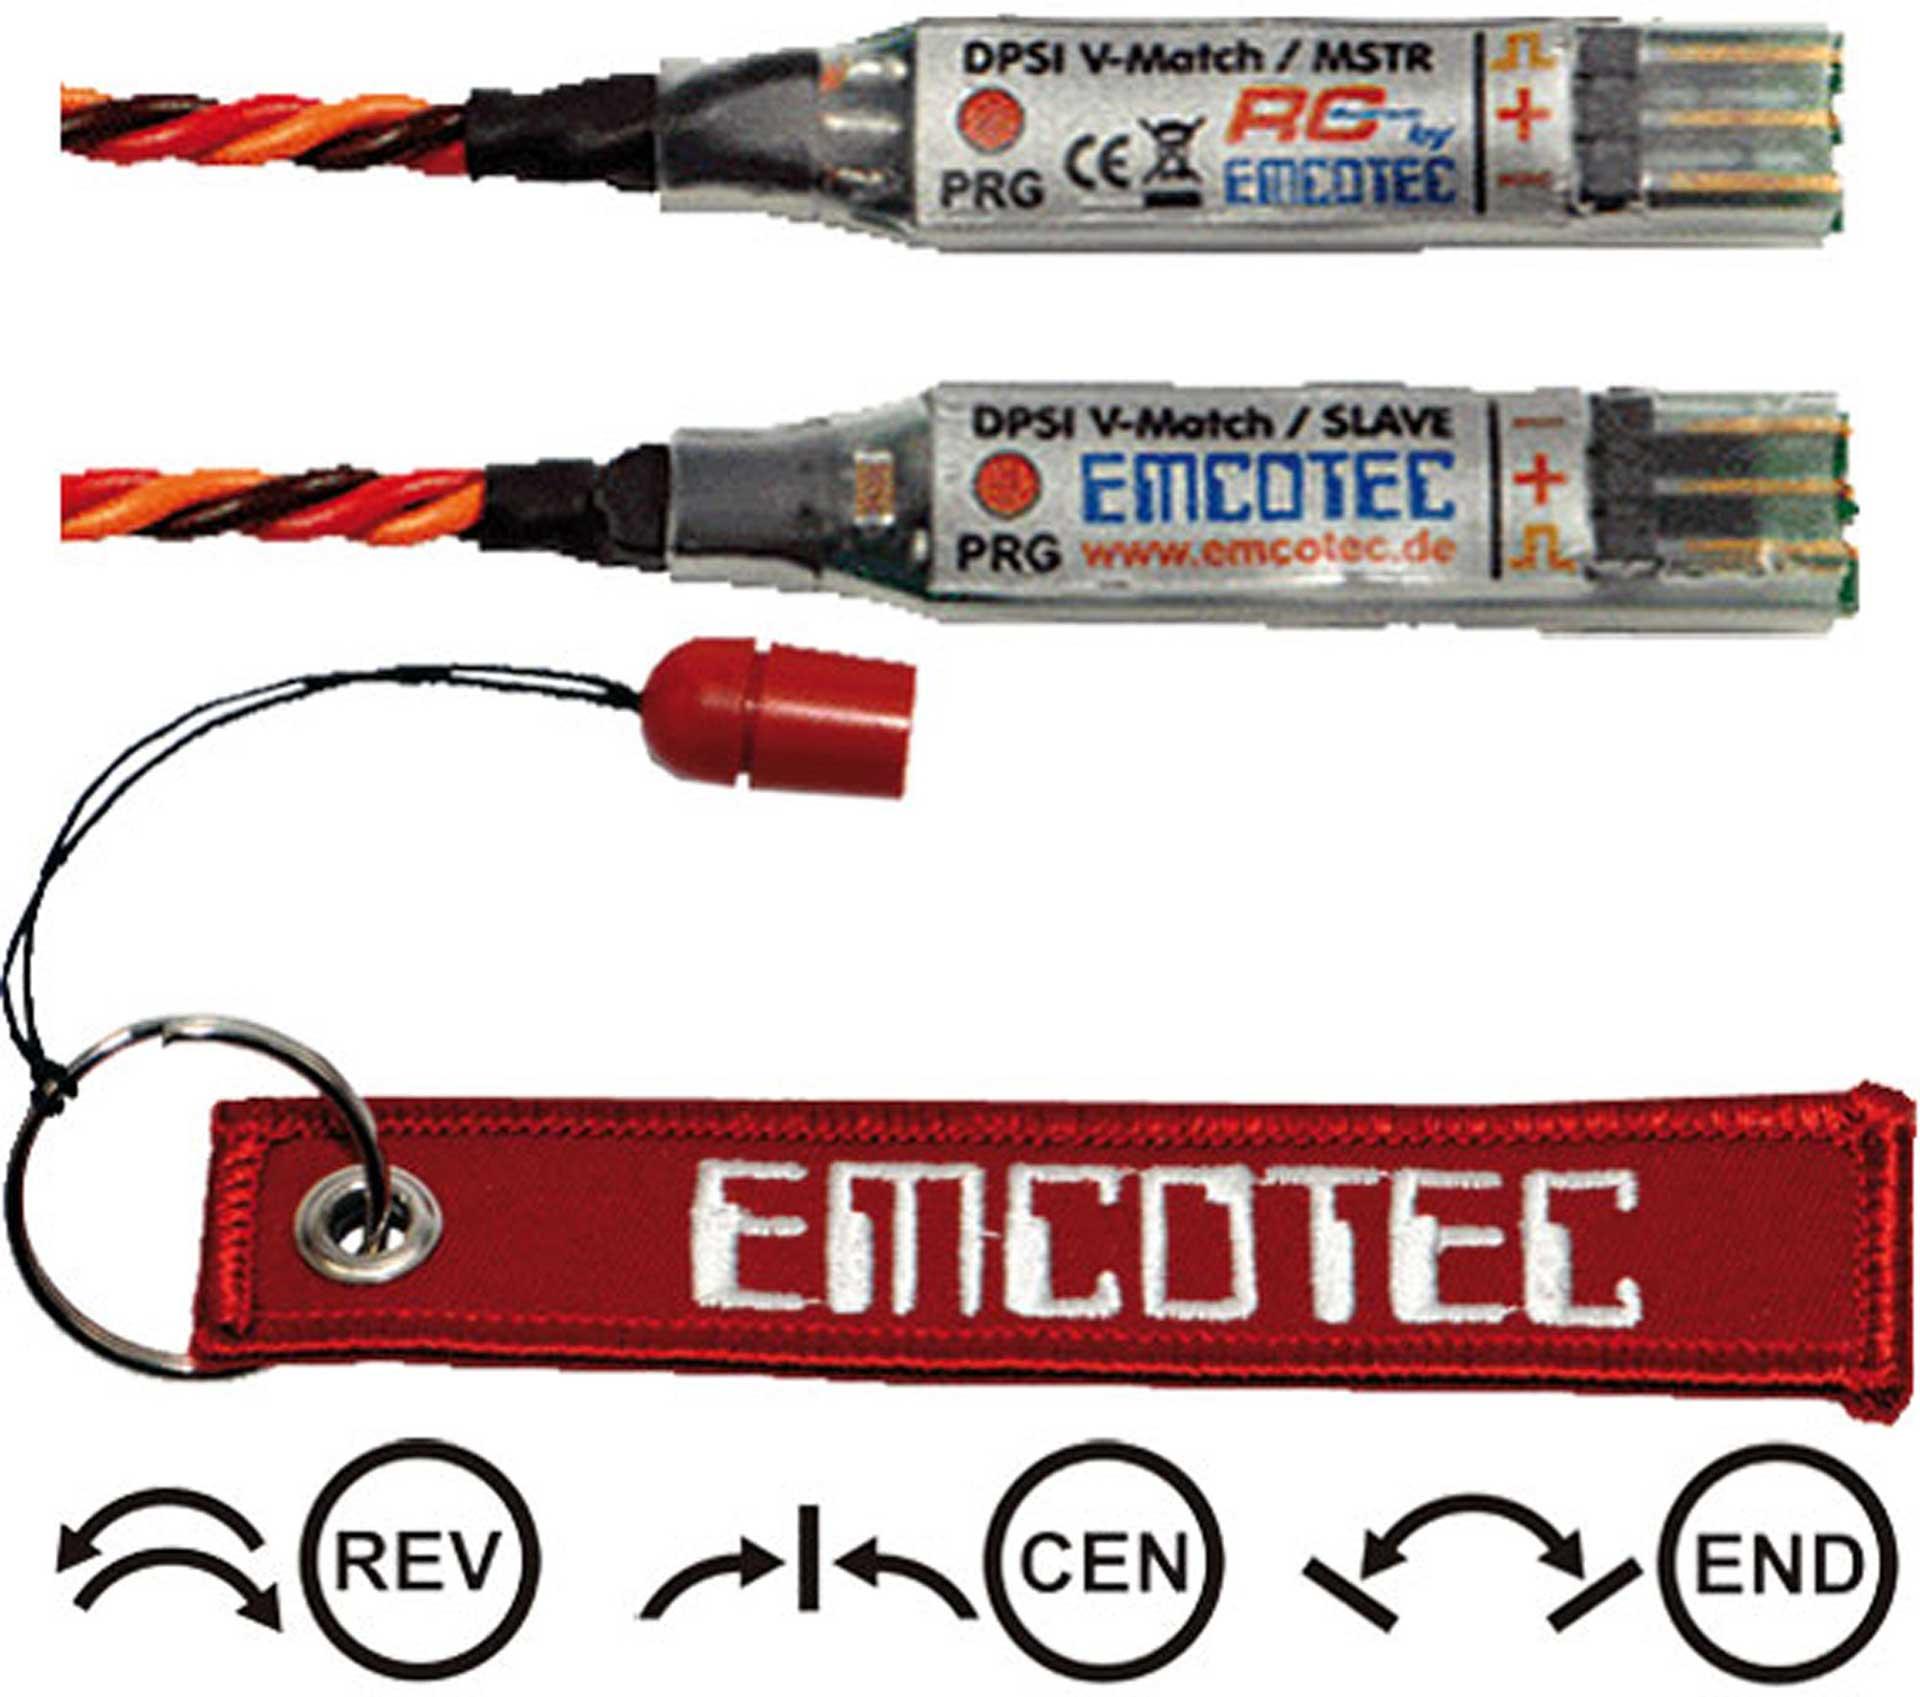 EMCOTEC DPSI V-MATCH